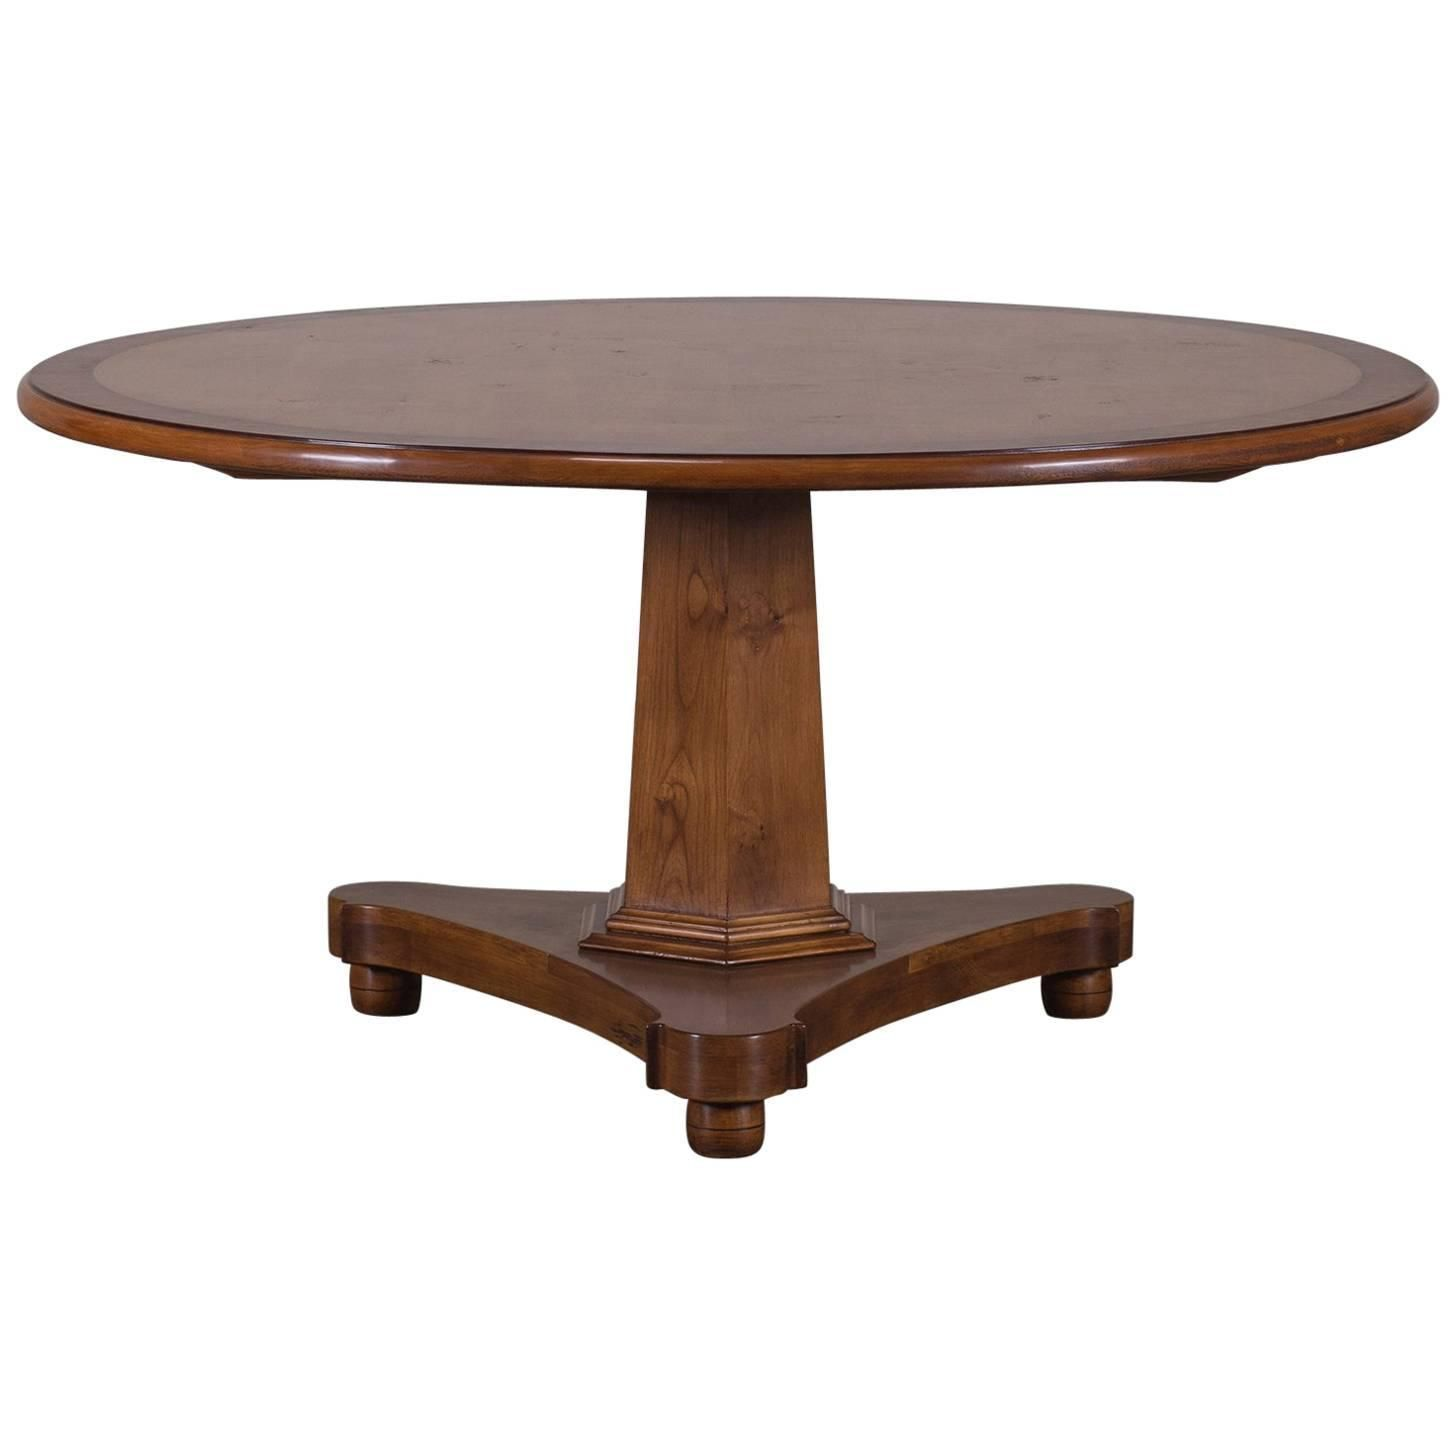 round pedestal kitchen table English Regency Style Cherrywood Round Pedestal Dining Table